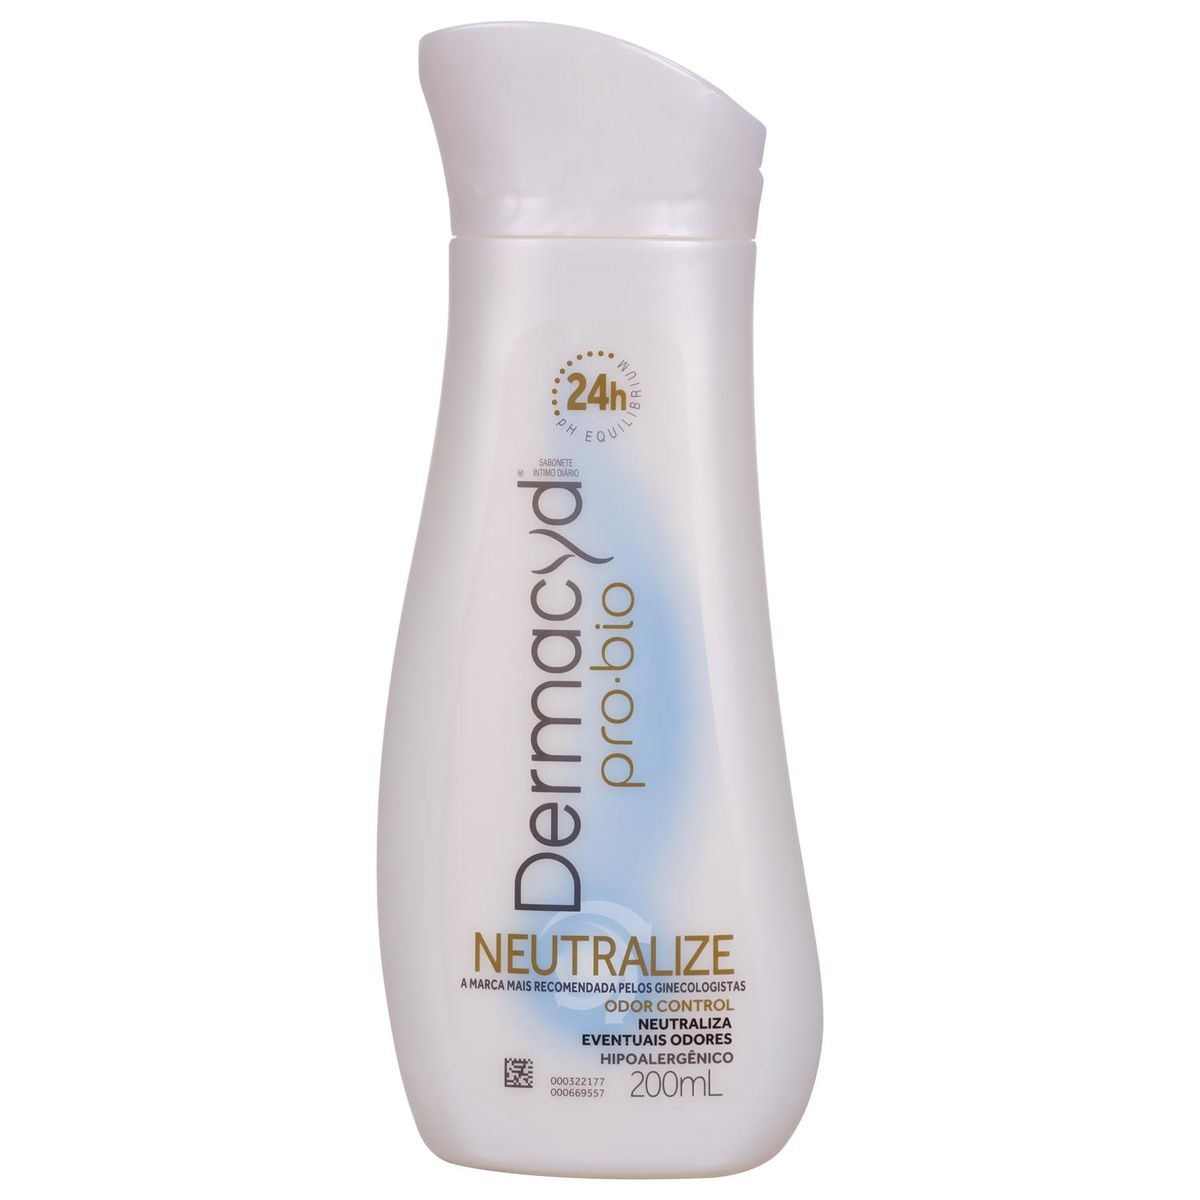 Sabonete Líquido Íntimo Dermacyd Pro-Bio Neutralize com 200ml 200ml